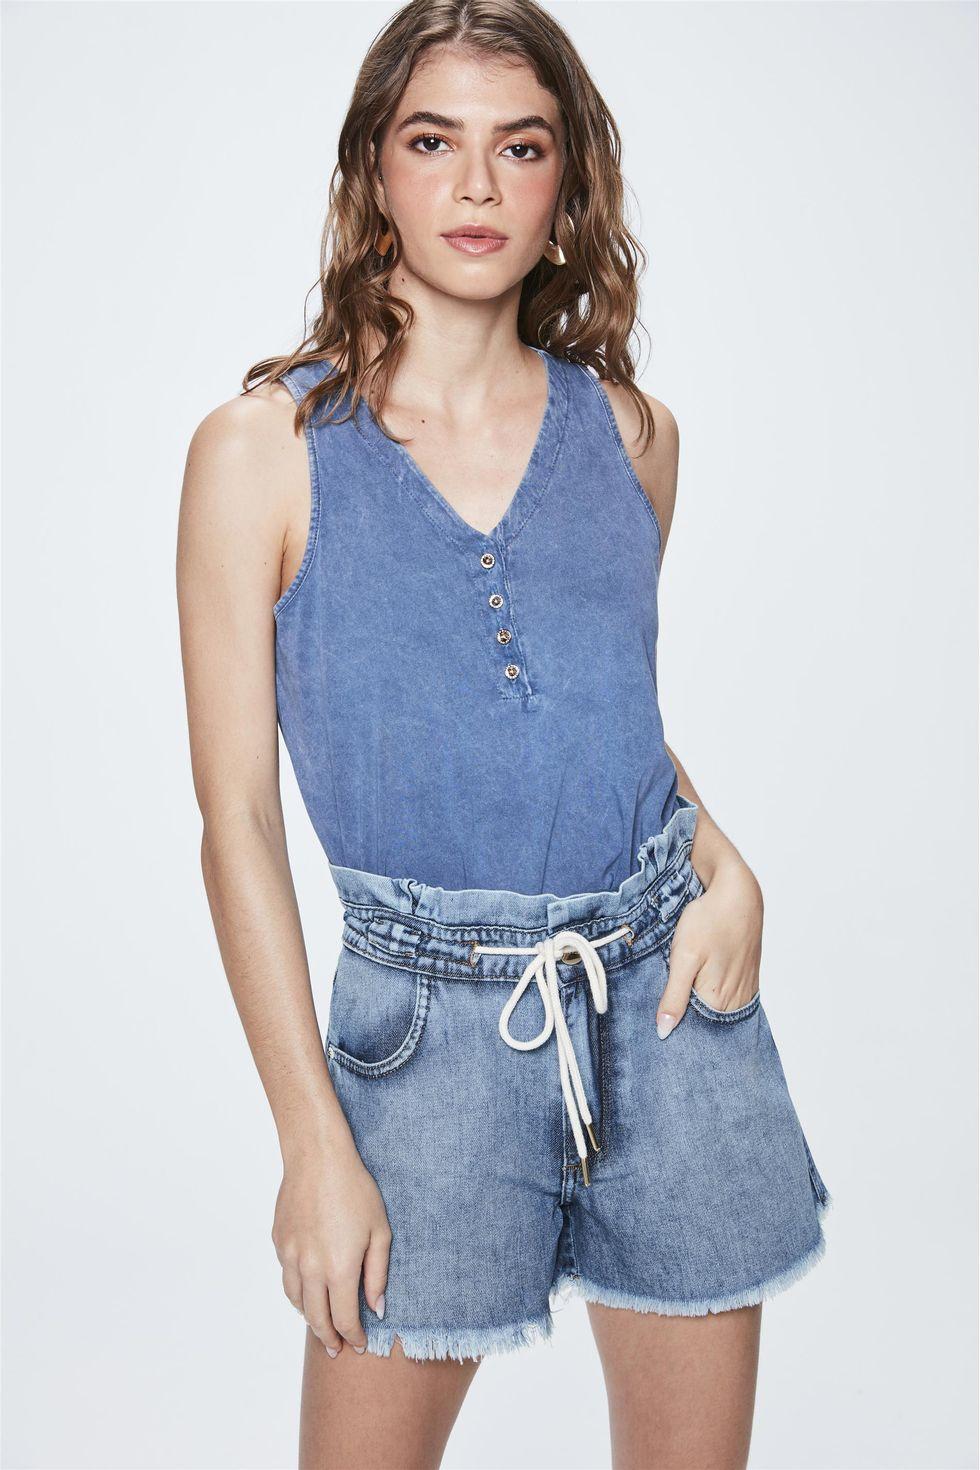 Short-Jeans-de-Cintura-Alta-Clochard-Frente--